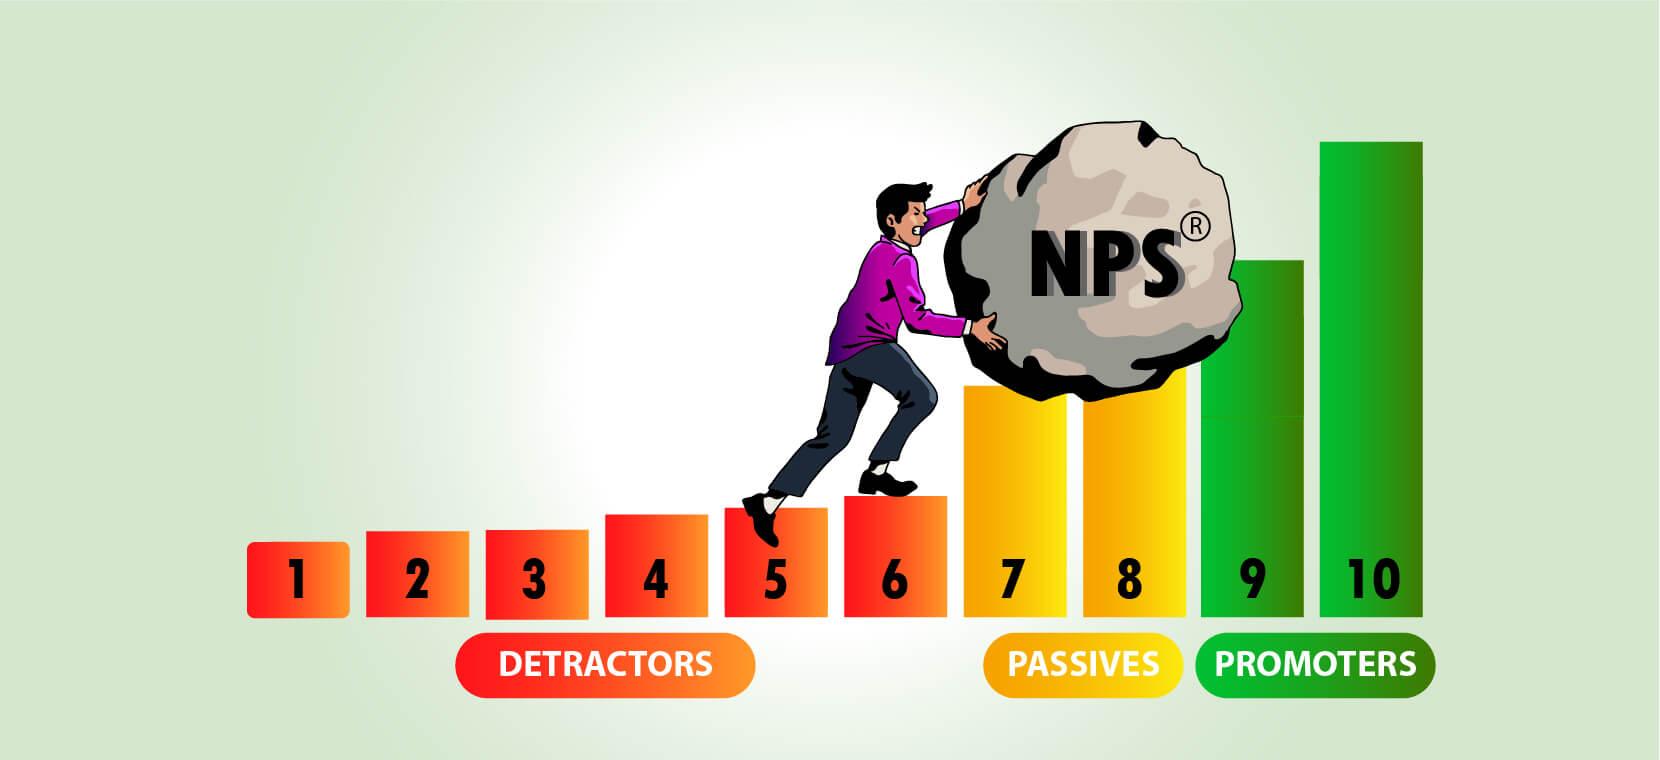 Improve Net Promoter Score®